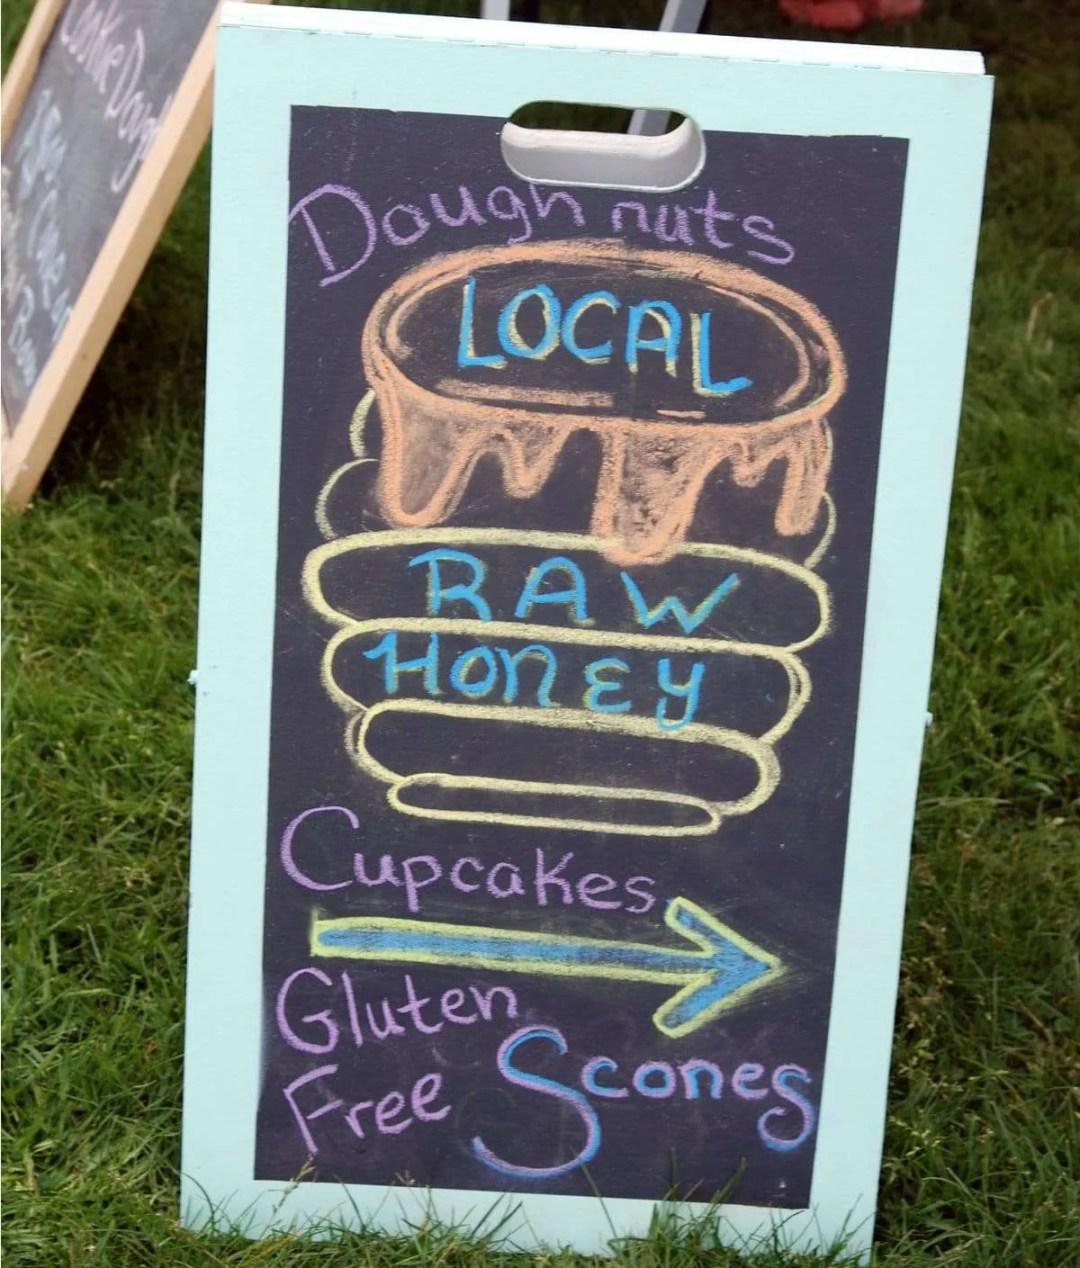 Craftsbury Farmers Market Vendor Products - honey, baked goods, coffee, tea